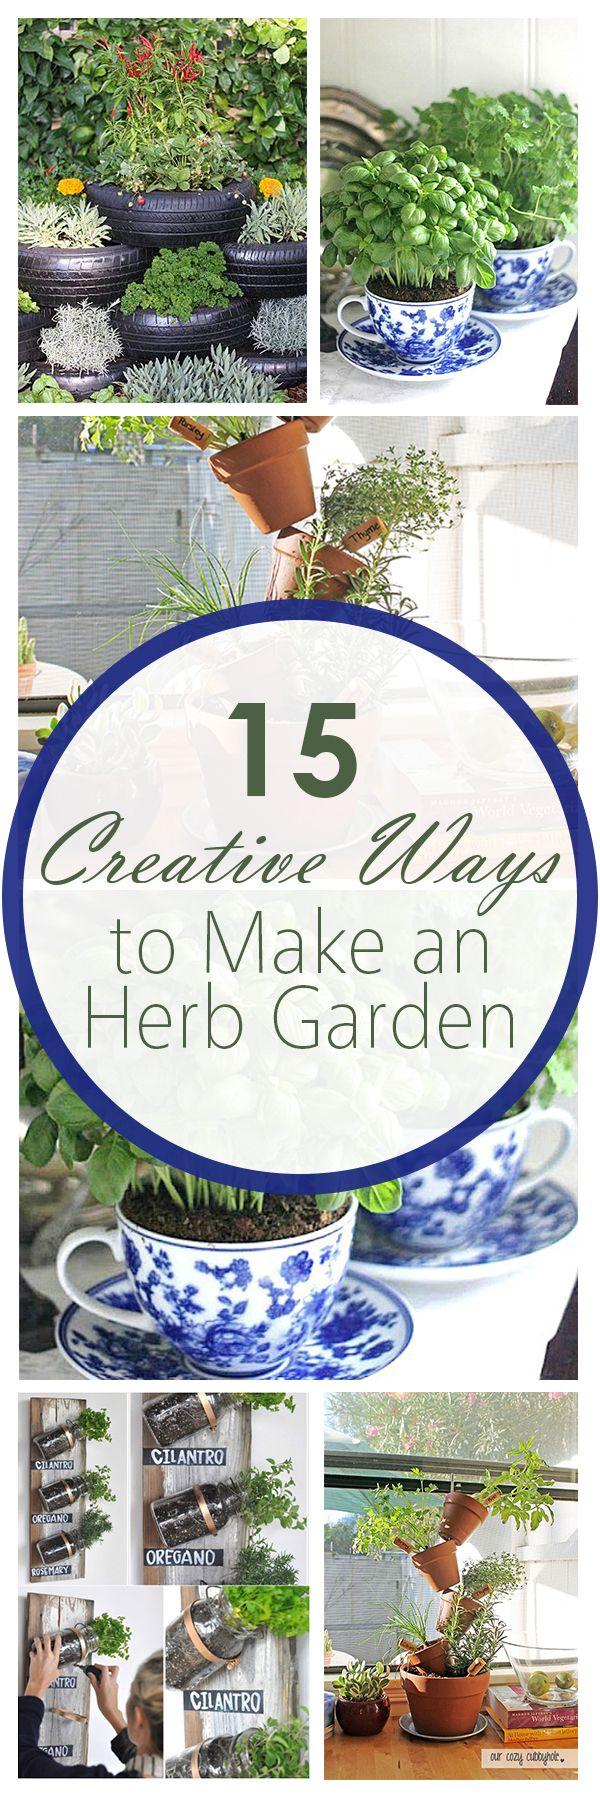 15 Creative Ways to Make an Herb Garden                                                                                                                                                                                 More